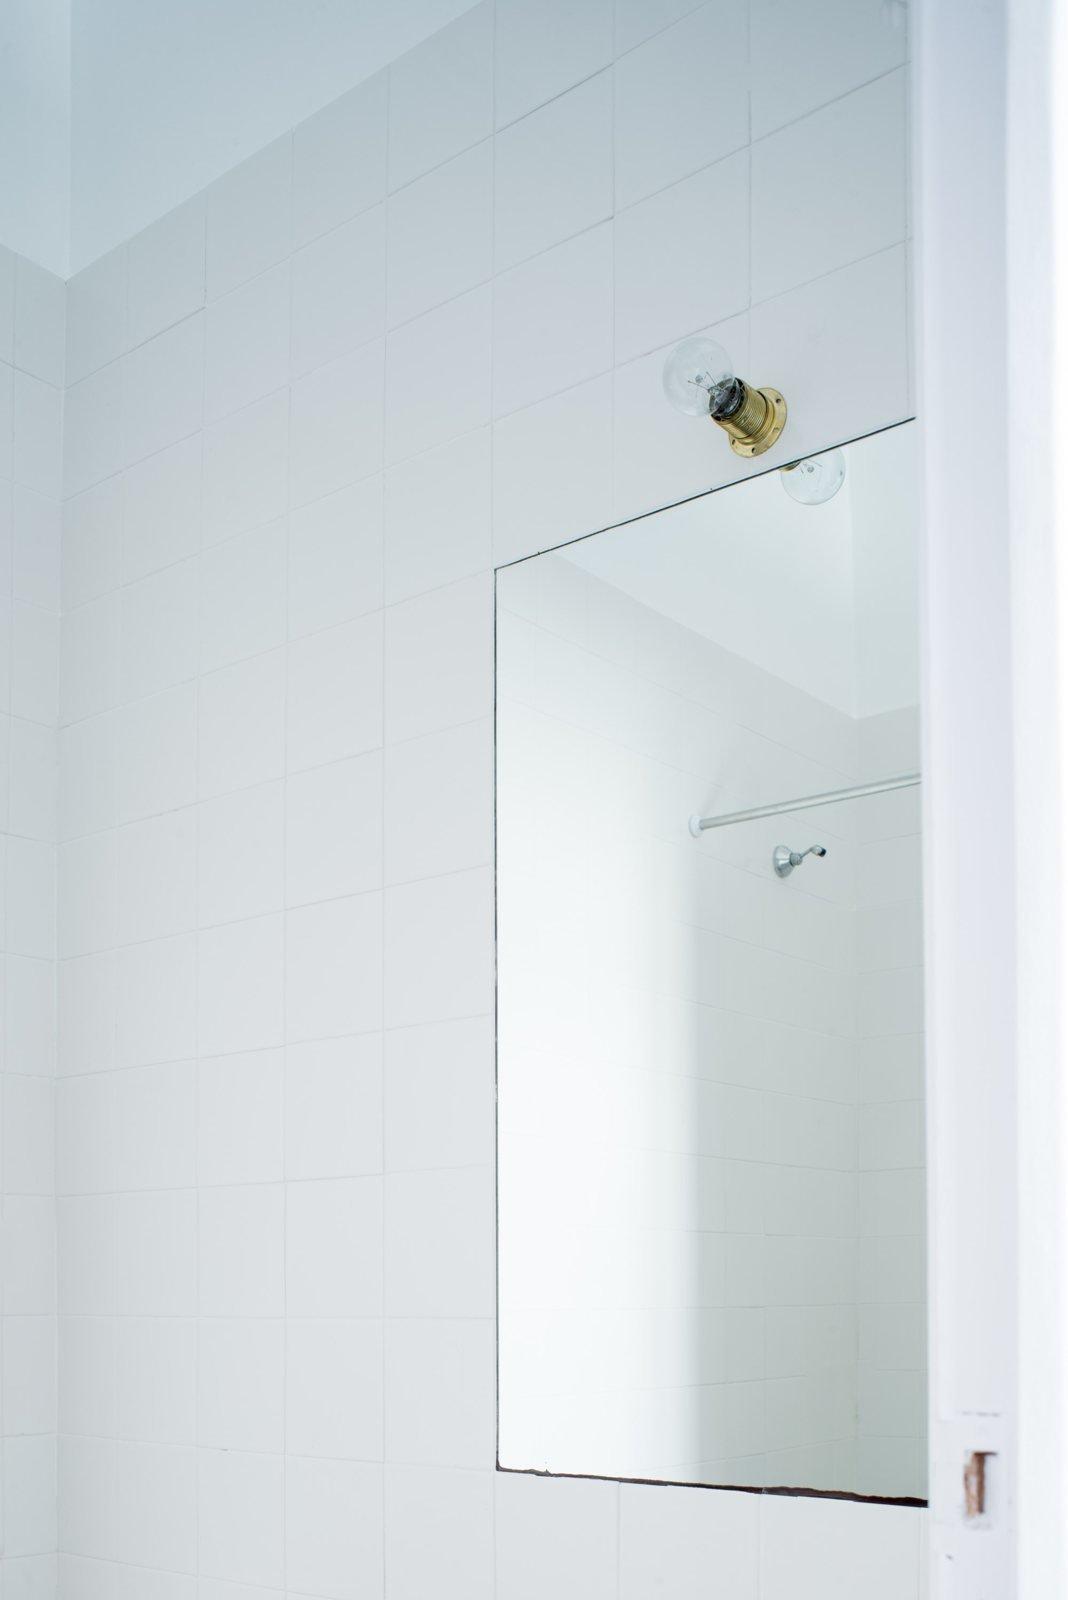 Simple bathroom vanity. Low Cost Bathroom by João Carmo Simões Architecture.  upinteriors.com/go/sph57  Details